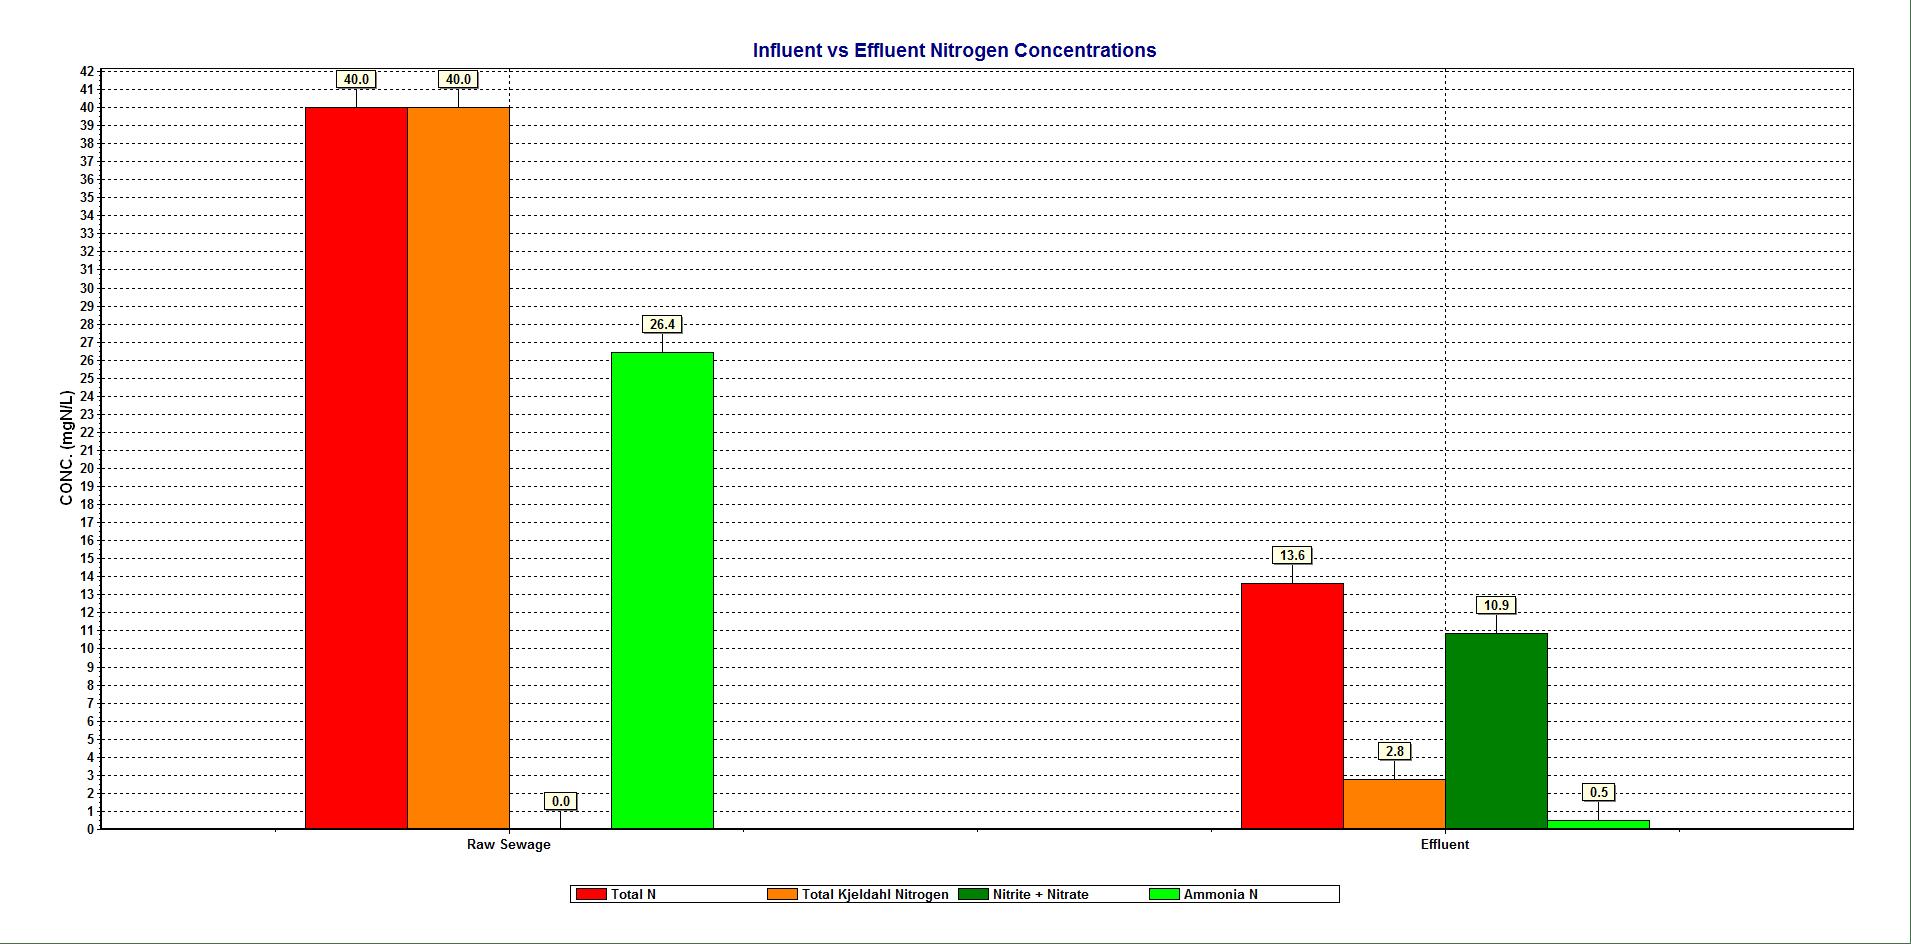 unblanced-influent-vs-effluent-nitrogen-concentrations